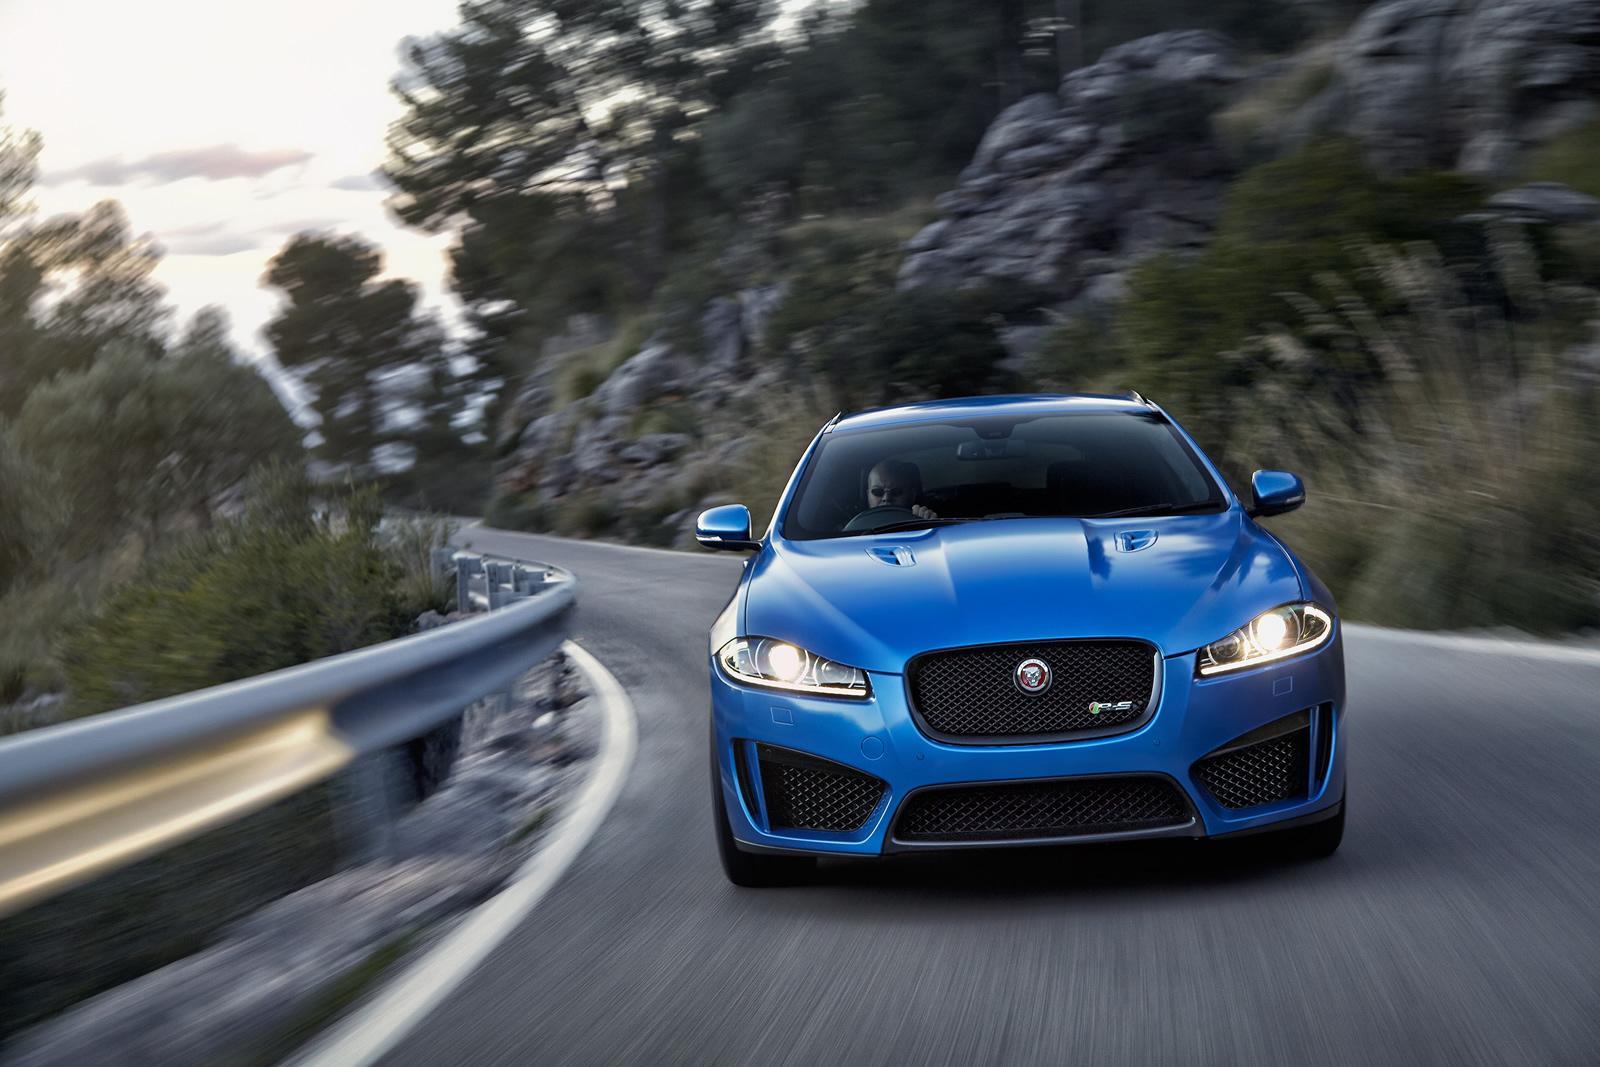 Jaguar Cars - News: XFR-S Sportbrake unveiled - packs 405 kW